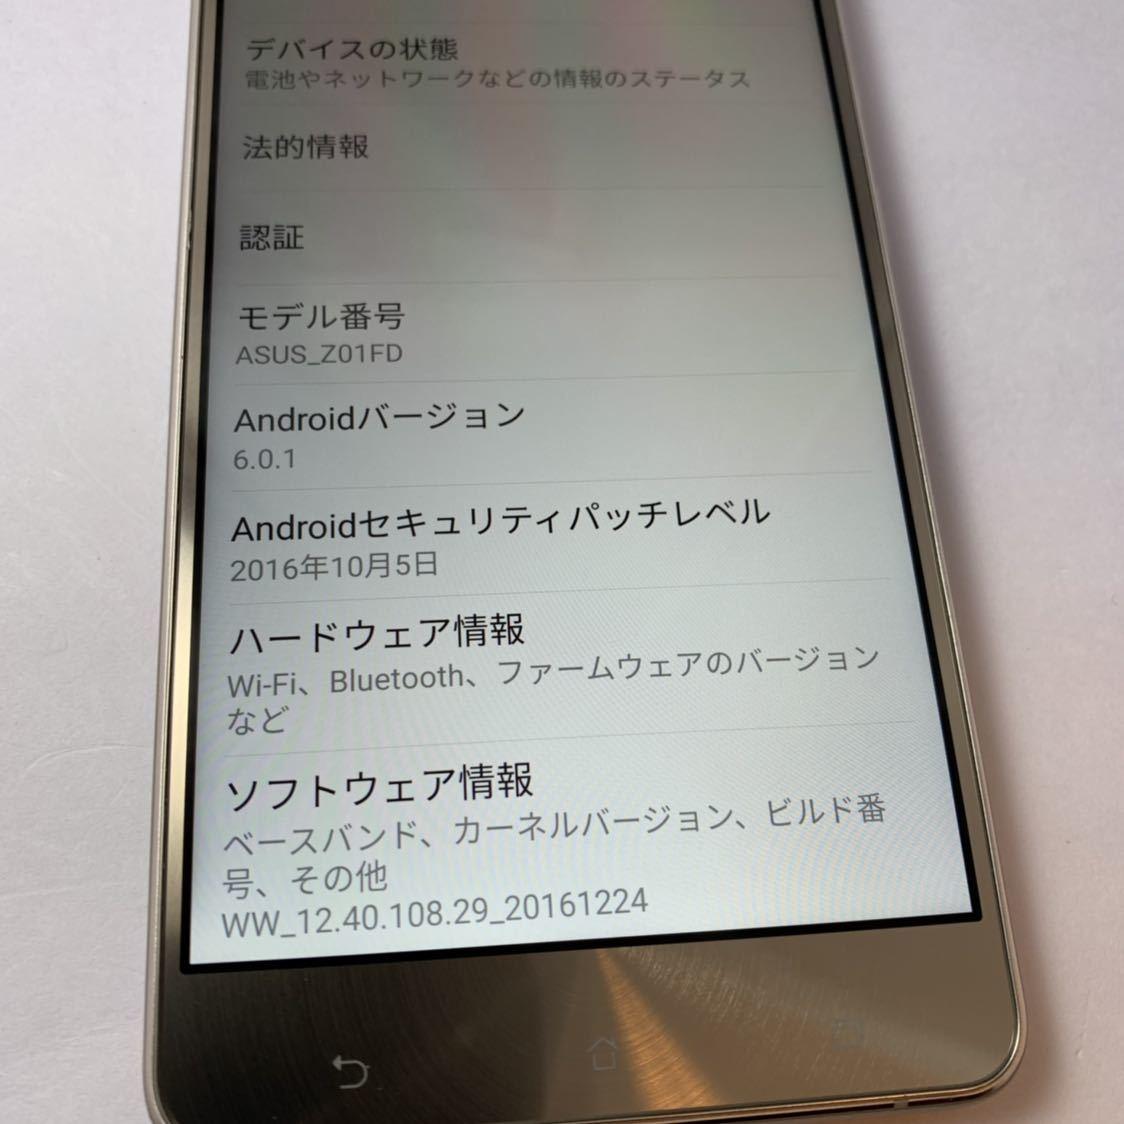 ASUS Zenfone 3 Deluxe 5.5 ZS550KL 64GB SIMフリー 本体 Z01FD ゴールド 海外版_画像8